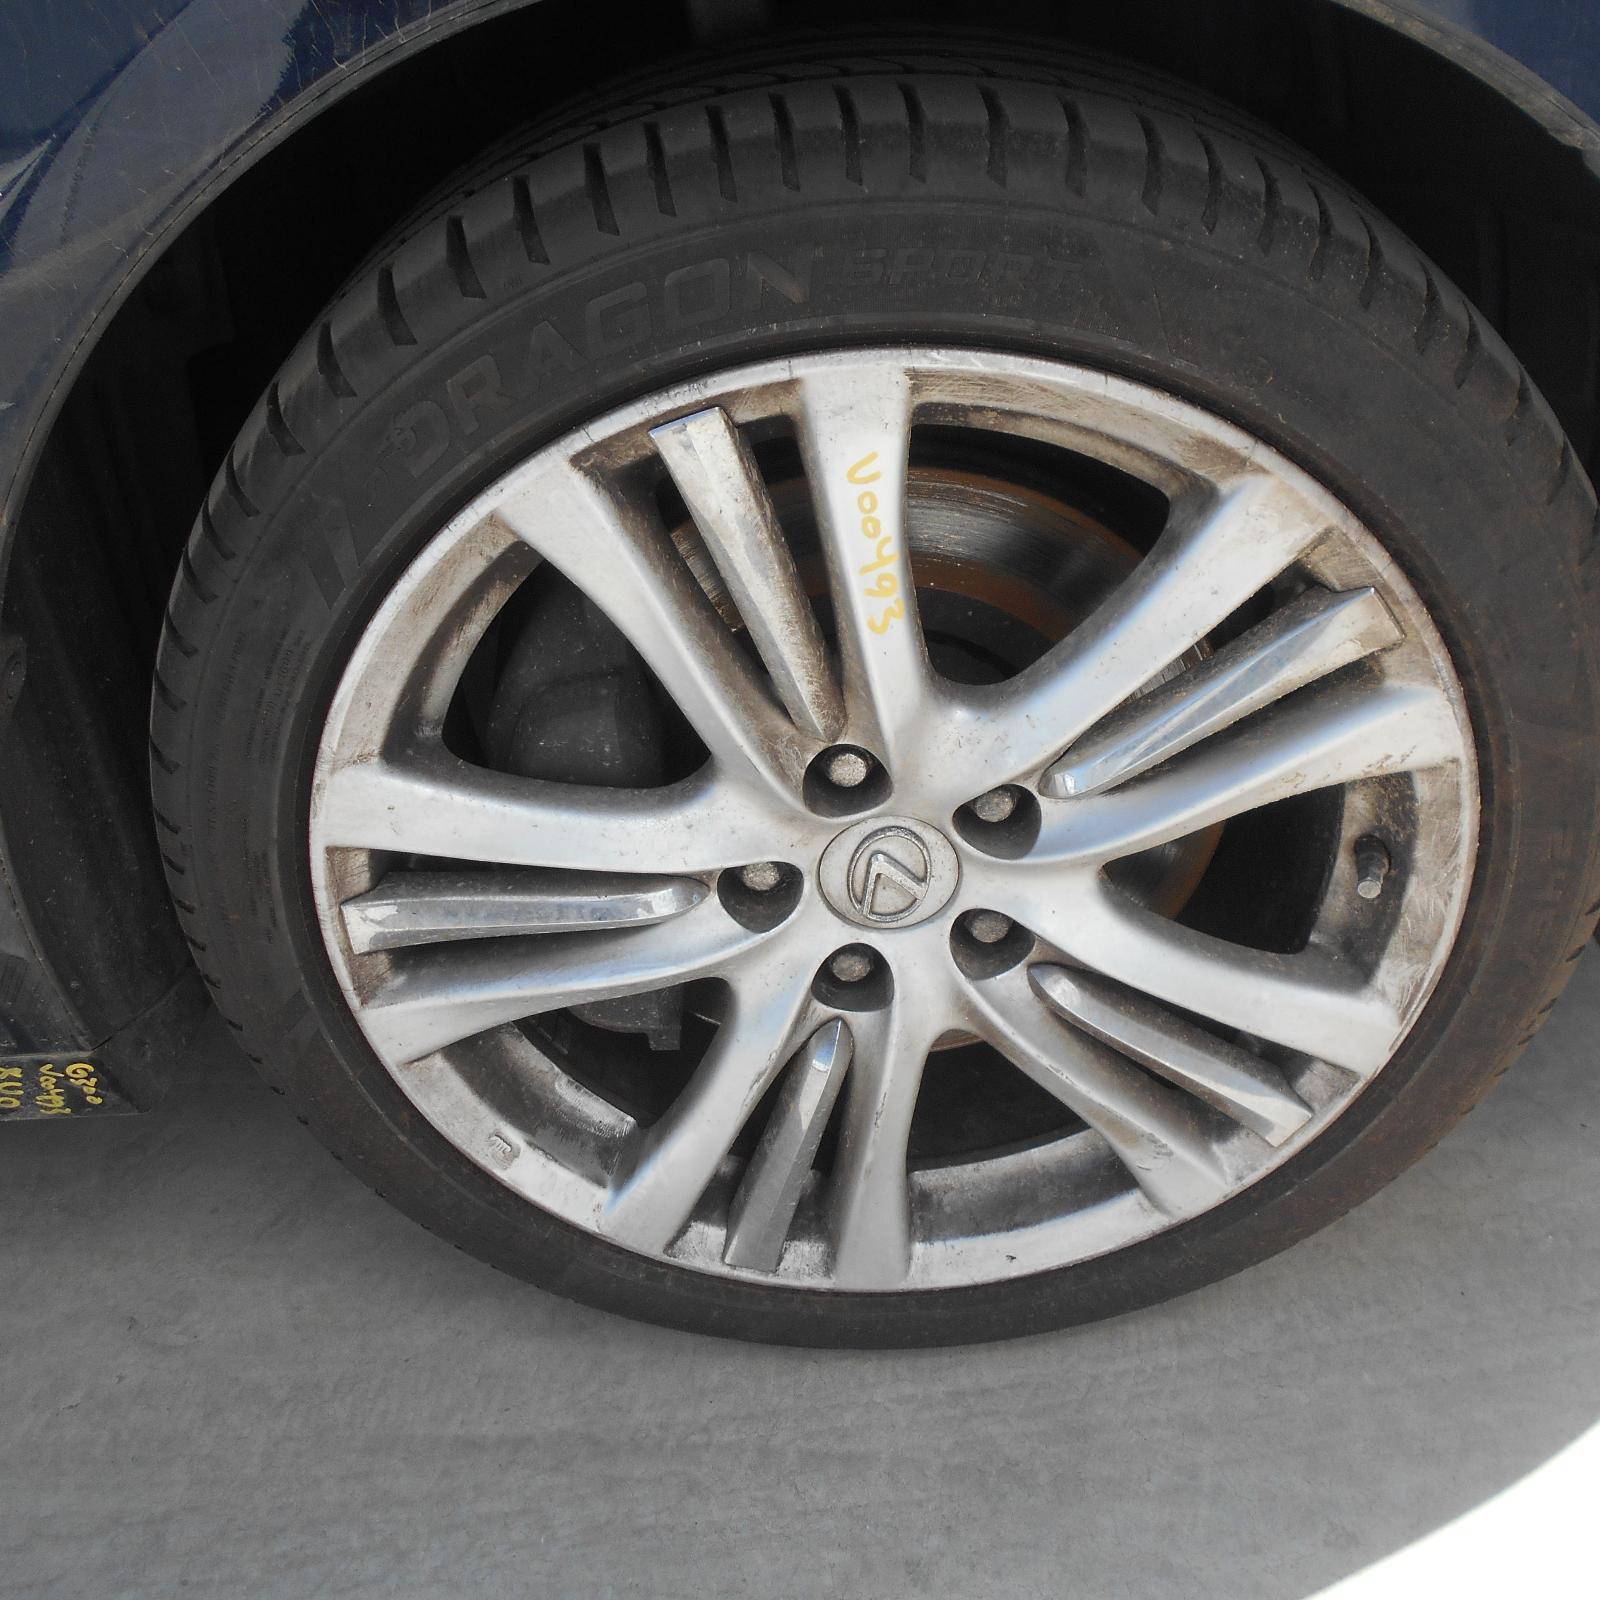 LEXUS GS, Wheel Mag, 190 SERIES, 03/05-12/11